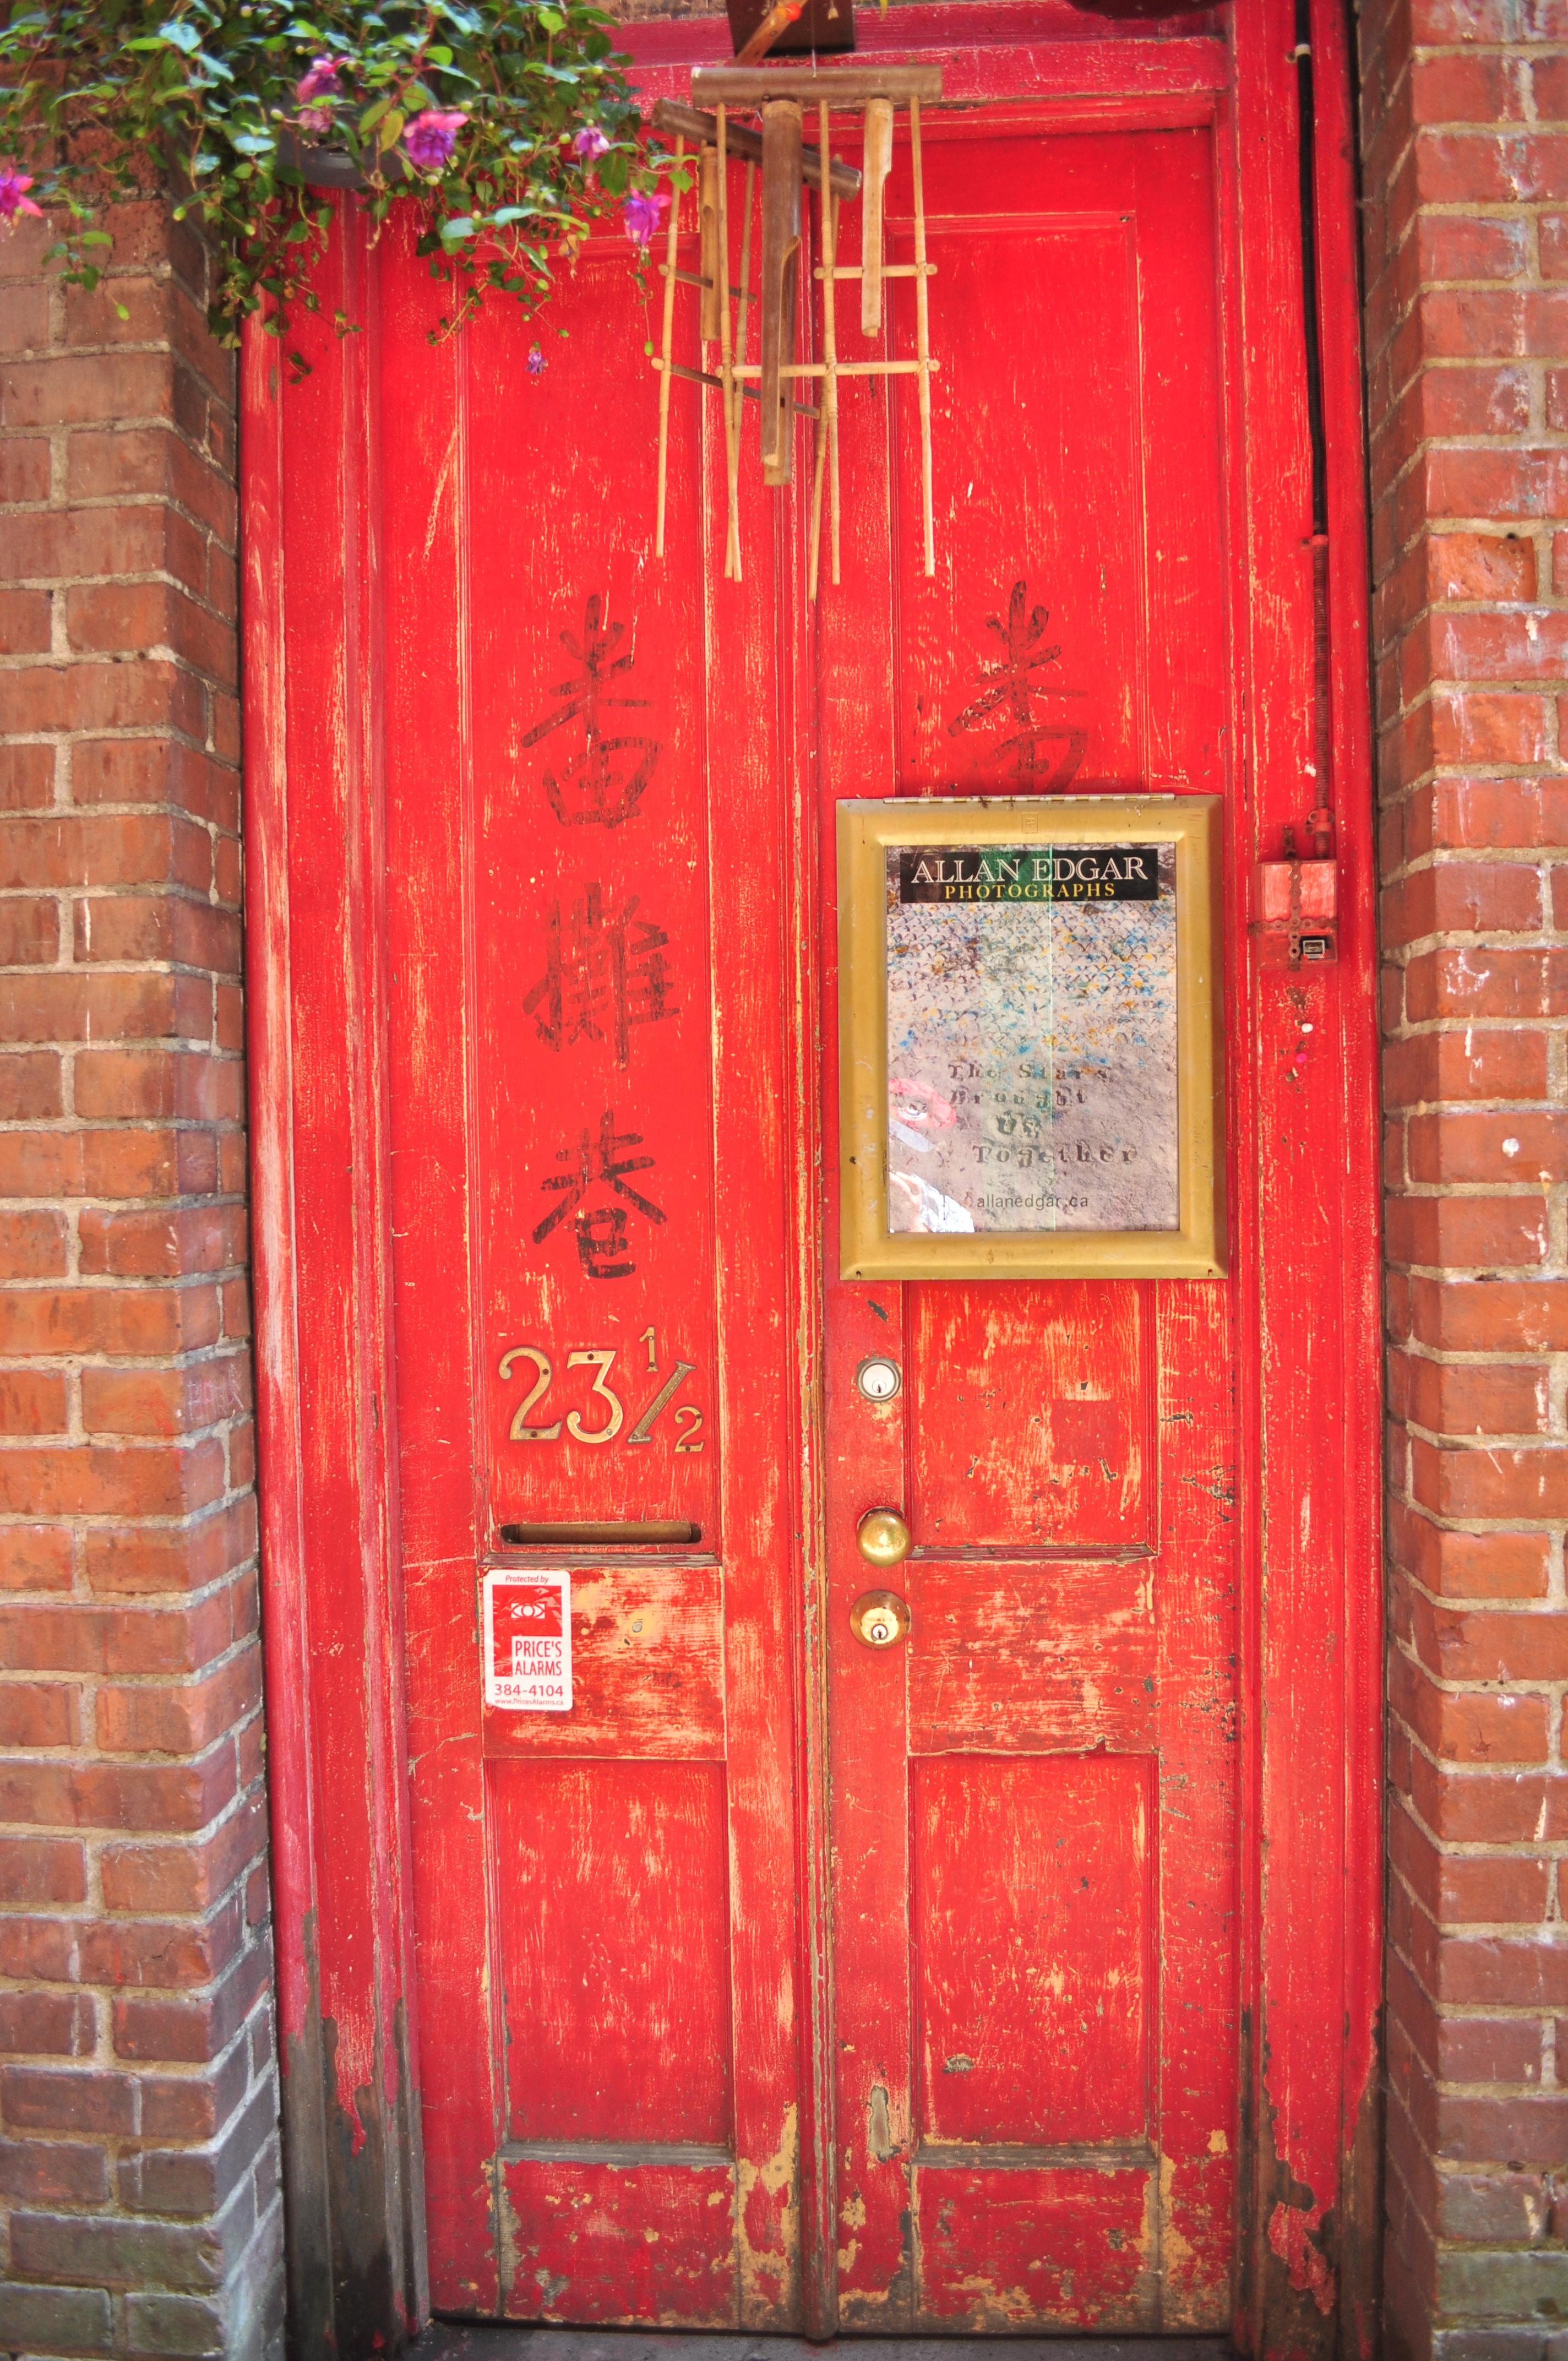 FileVictoria BC - Fan Tan Alley 03 - door of number 23- & File:Victoria BC - Fan Tan Alley 03 - door of number 23-and-a-half ...